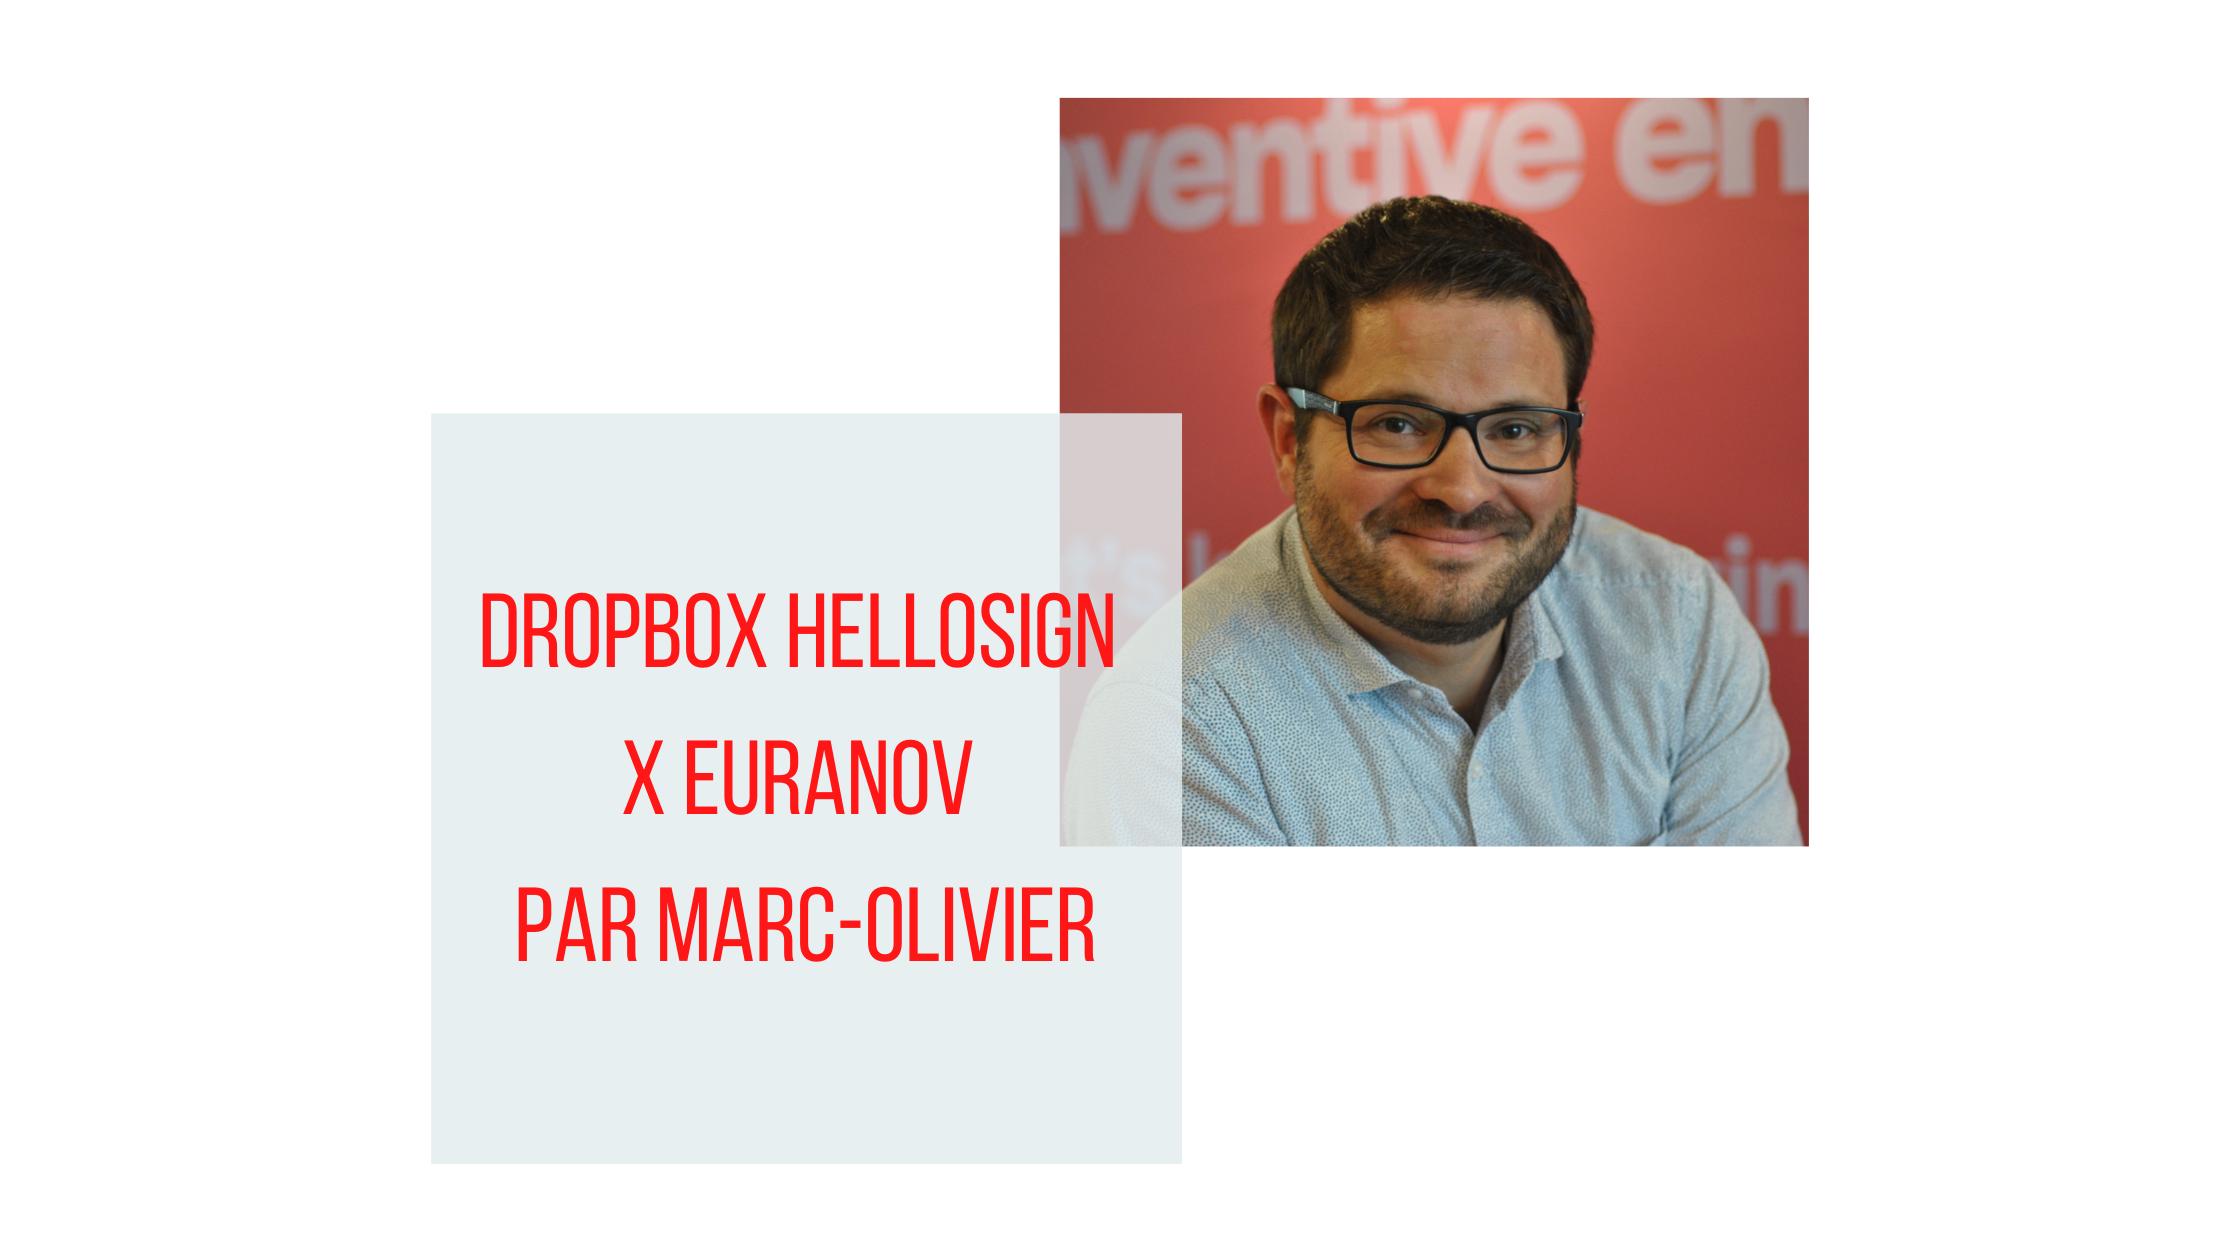 Dropbox, HelloSign X euraNov